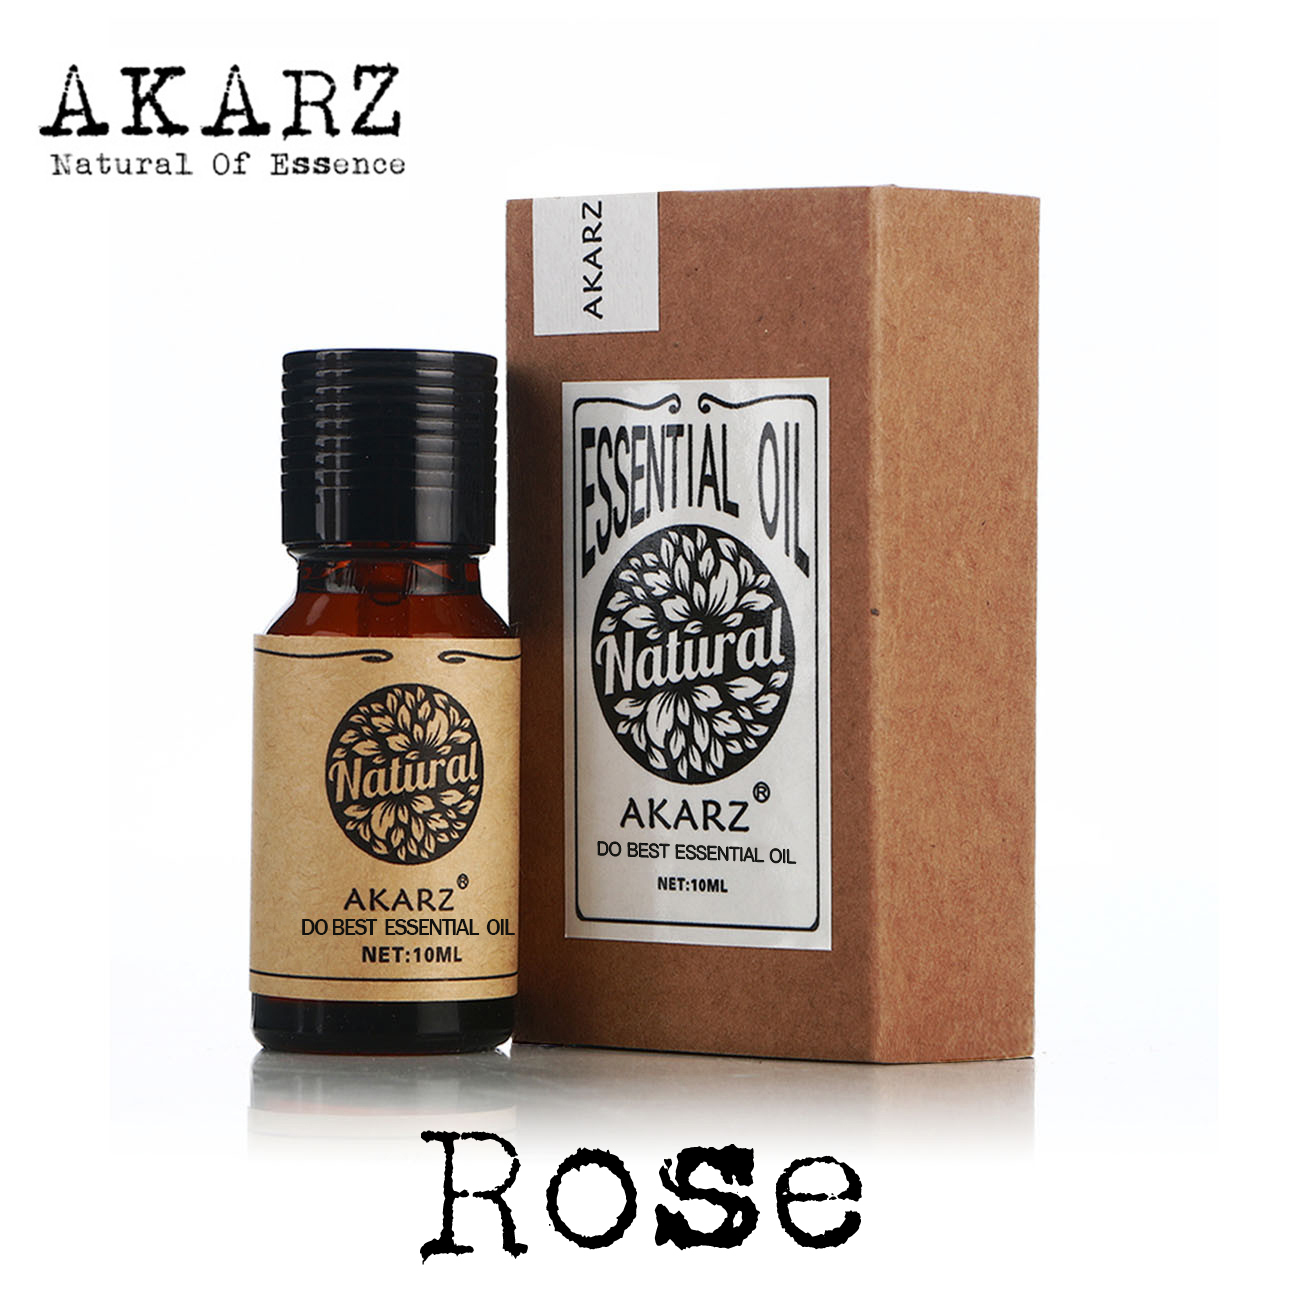 AKARZ Famous brand aromatherapy rose essential oil Whitening anti-aging wrinkle relax pigmentation remove beriberi rose oil